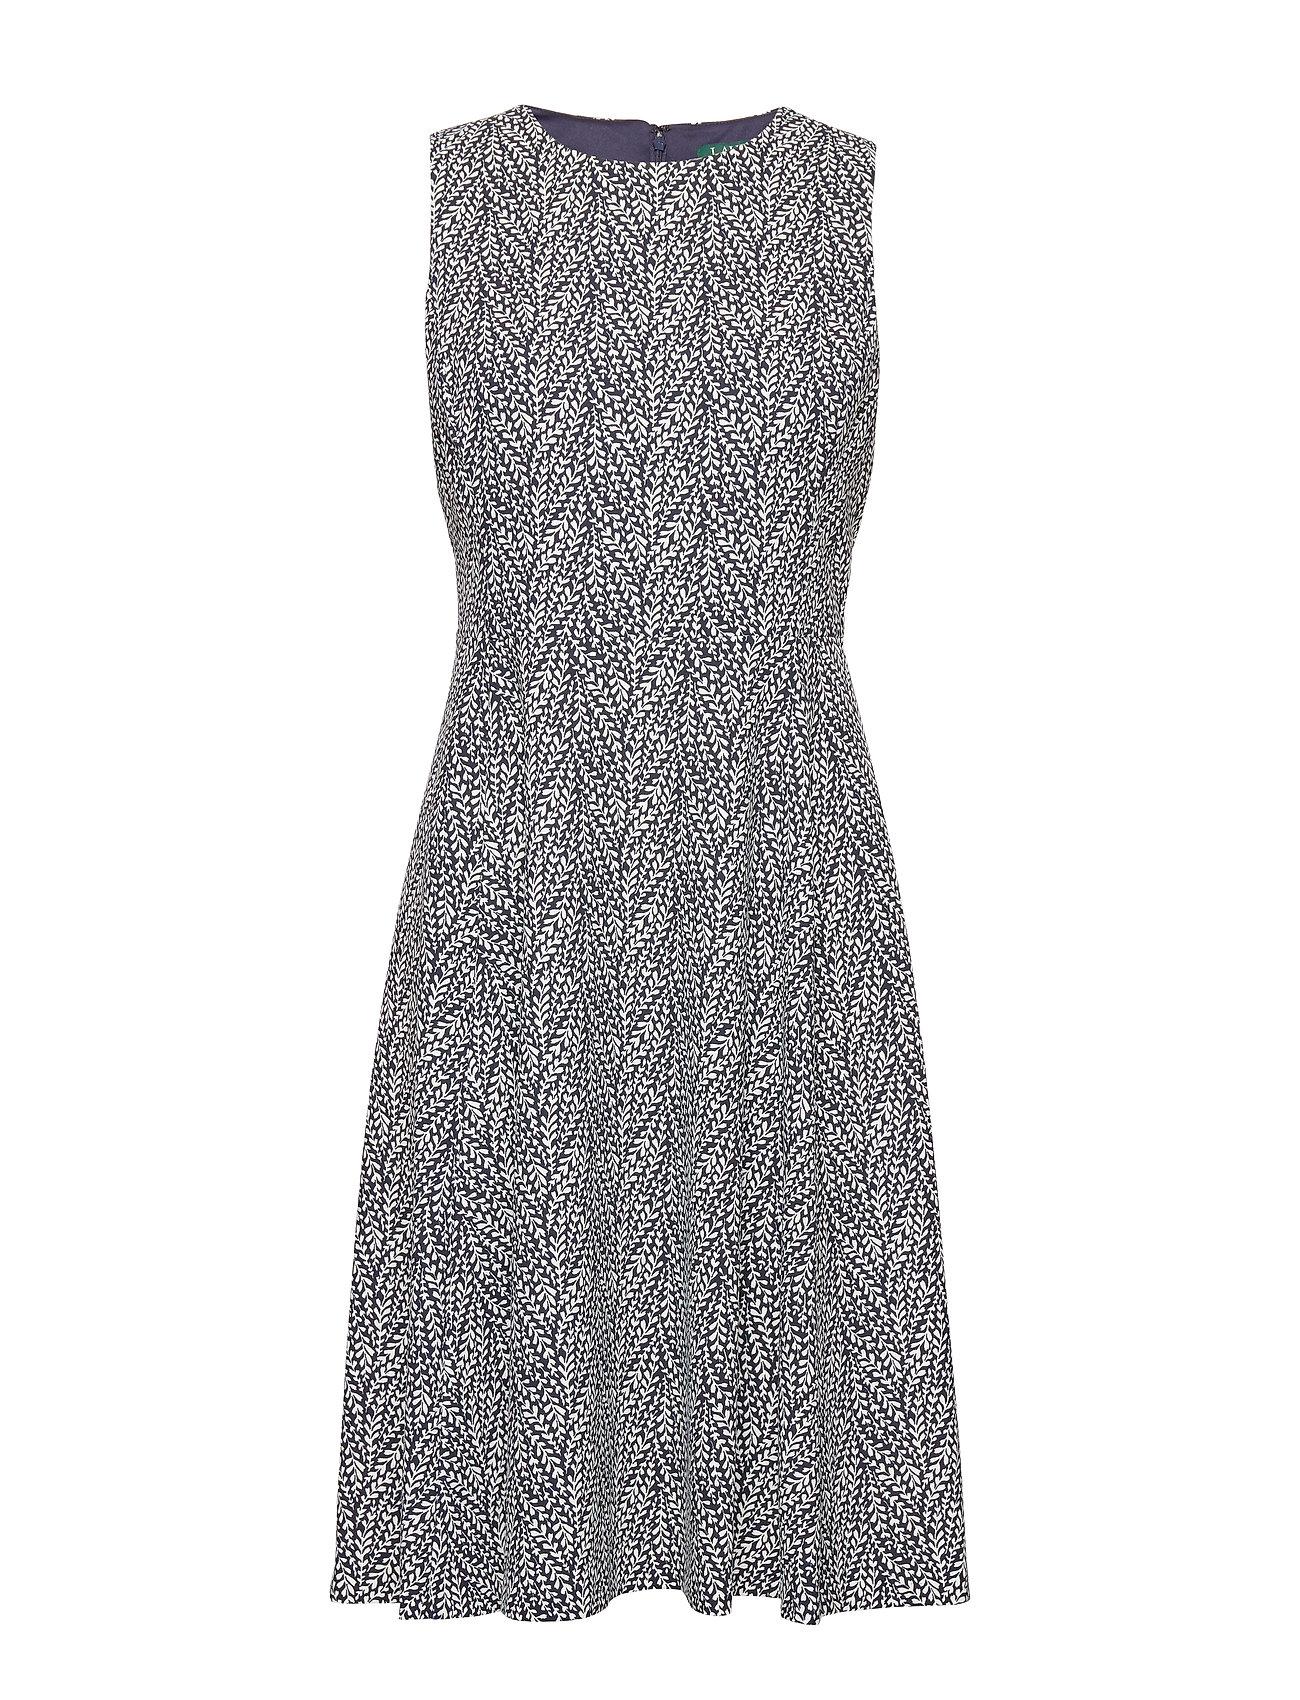 Lauren Ralph Lauren PRINTED TECH CREPE-DRESS - LIGHTHOUSE NAVY/C